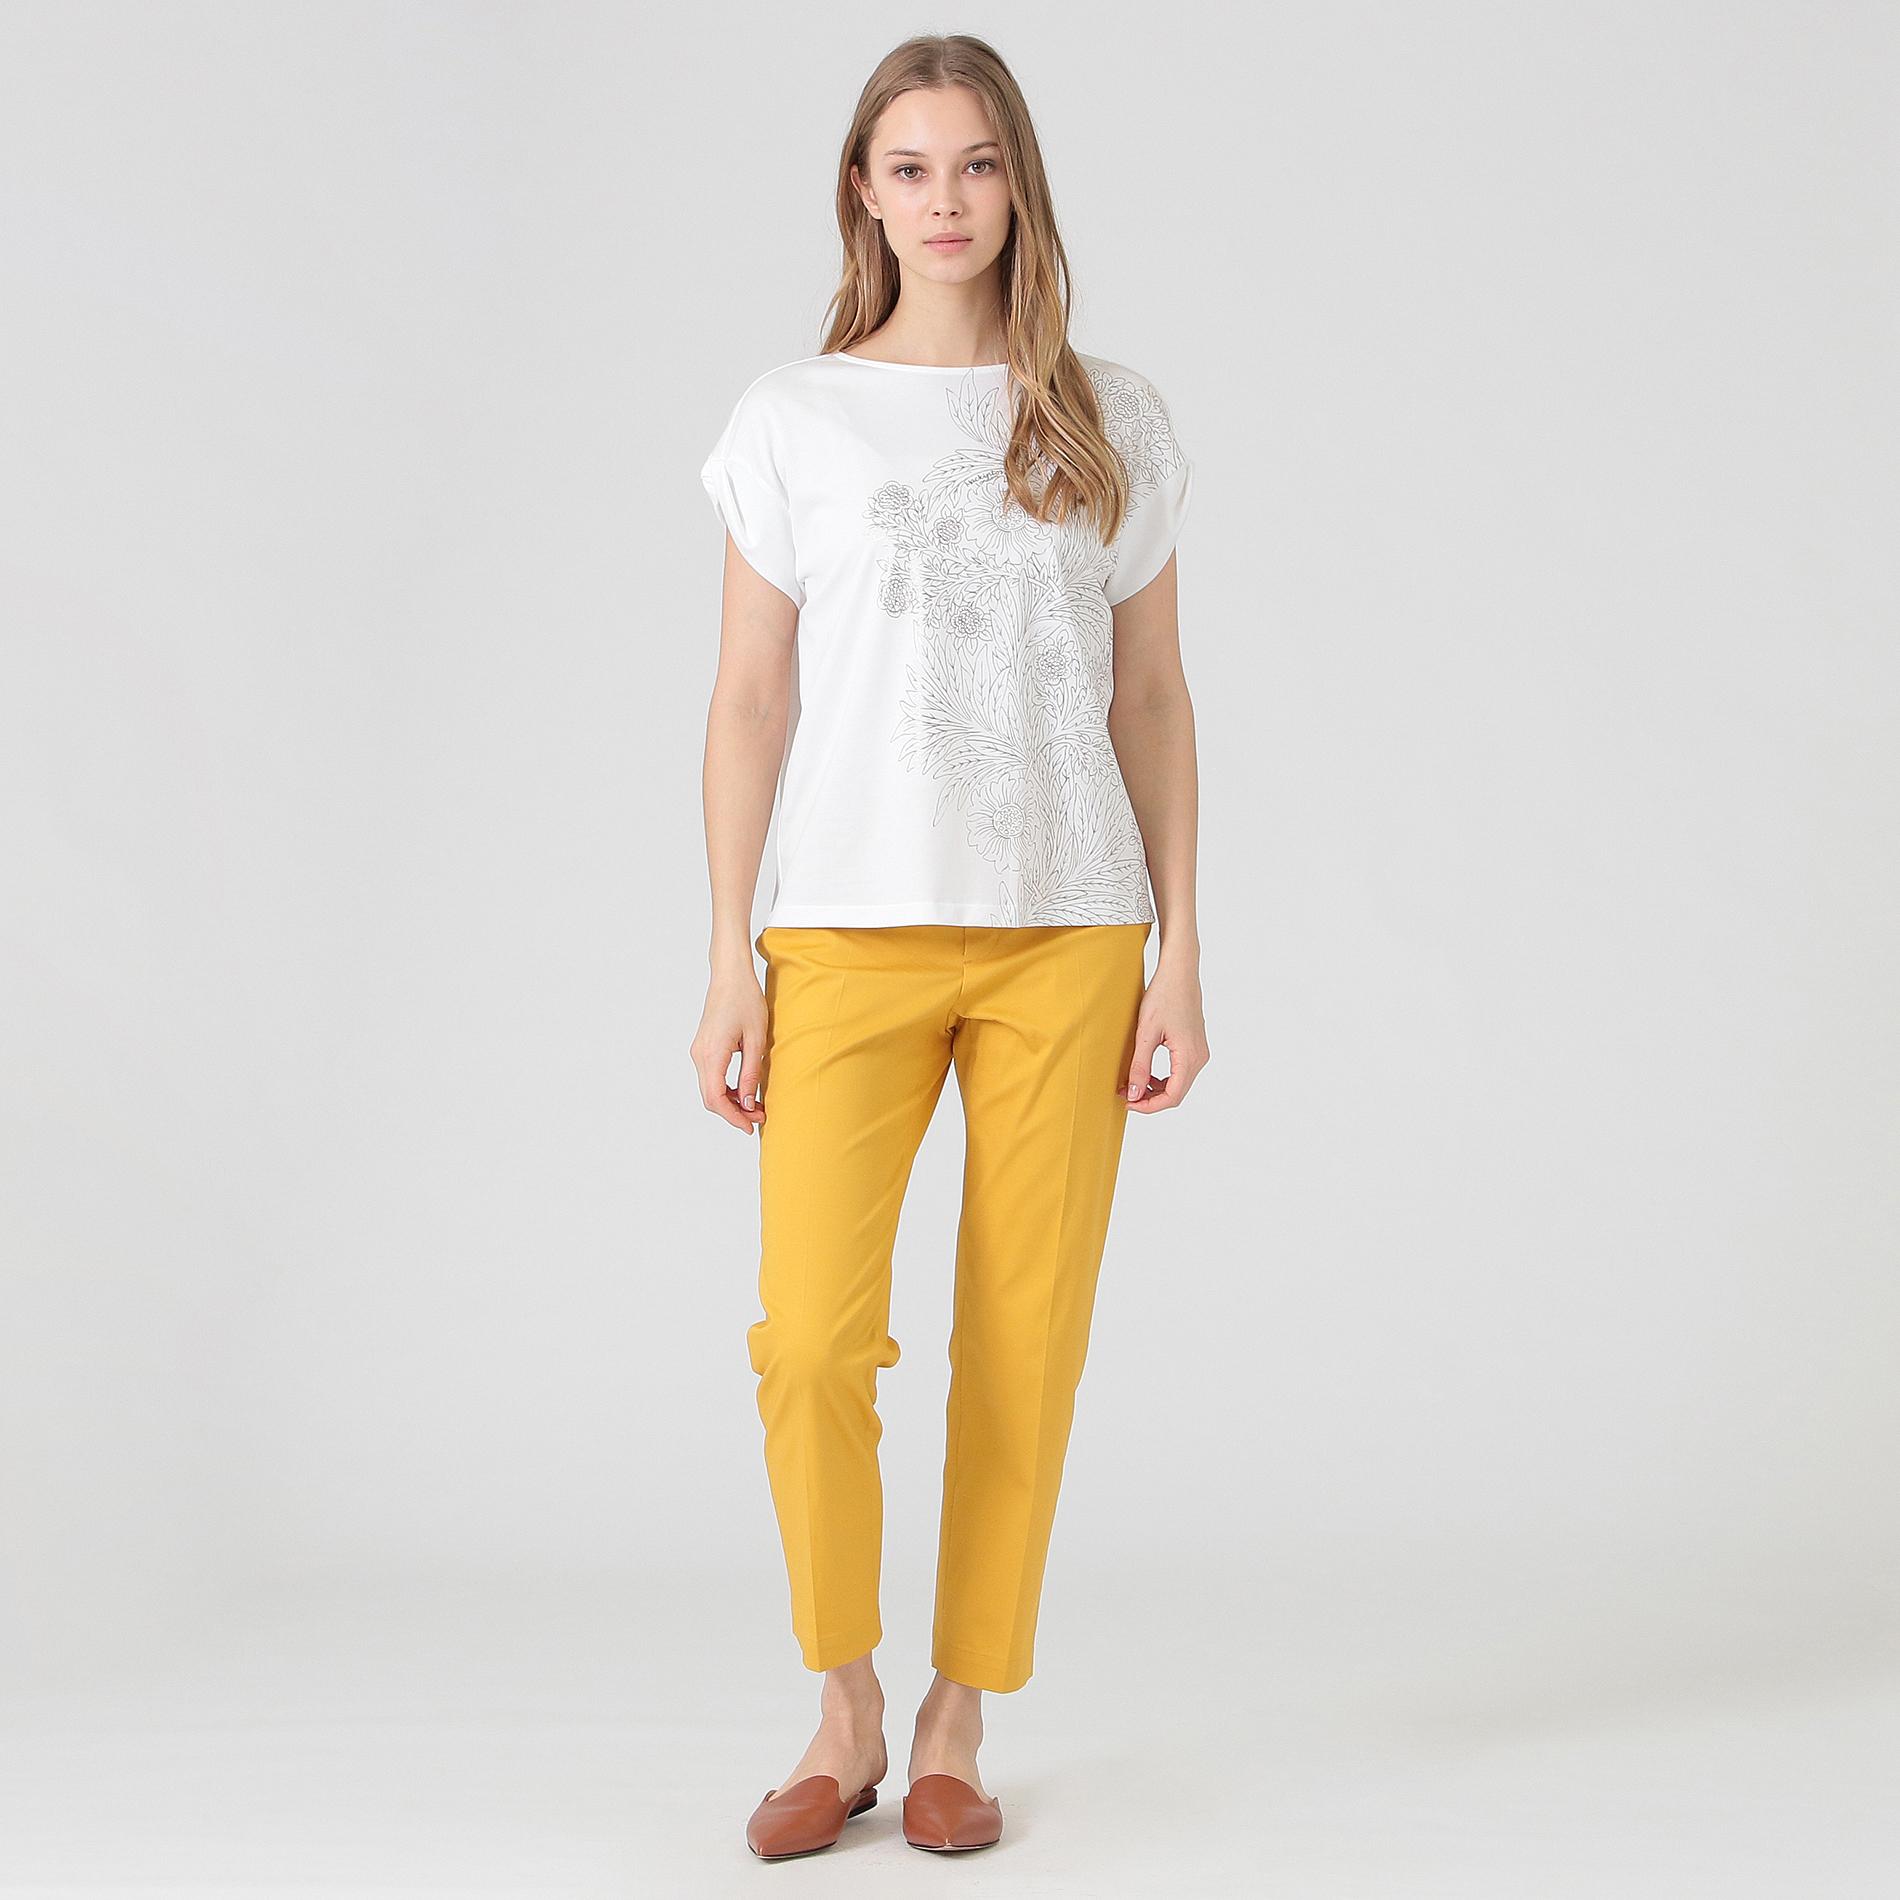 【BIBURY FLOWER】ラインプリントTシャツ